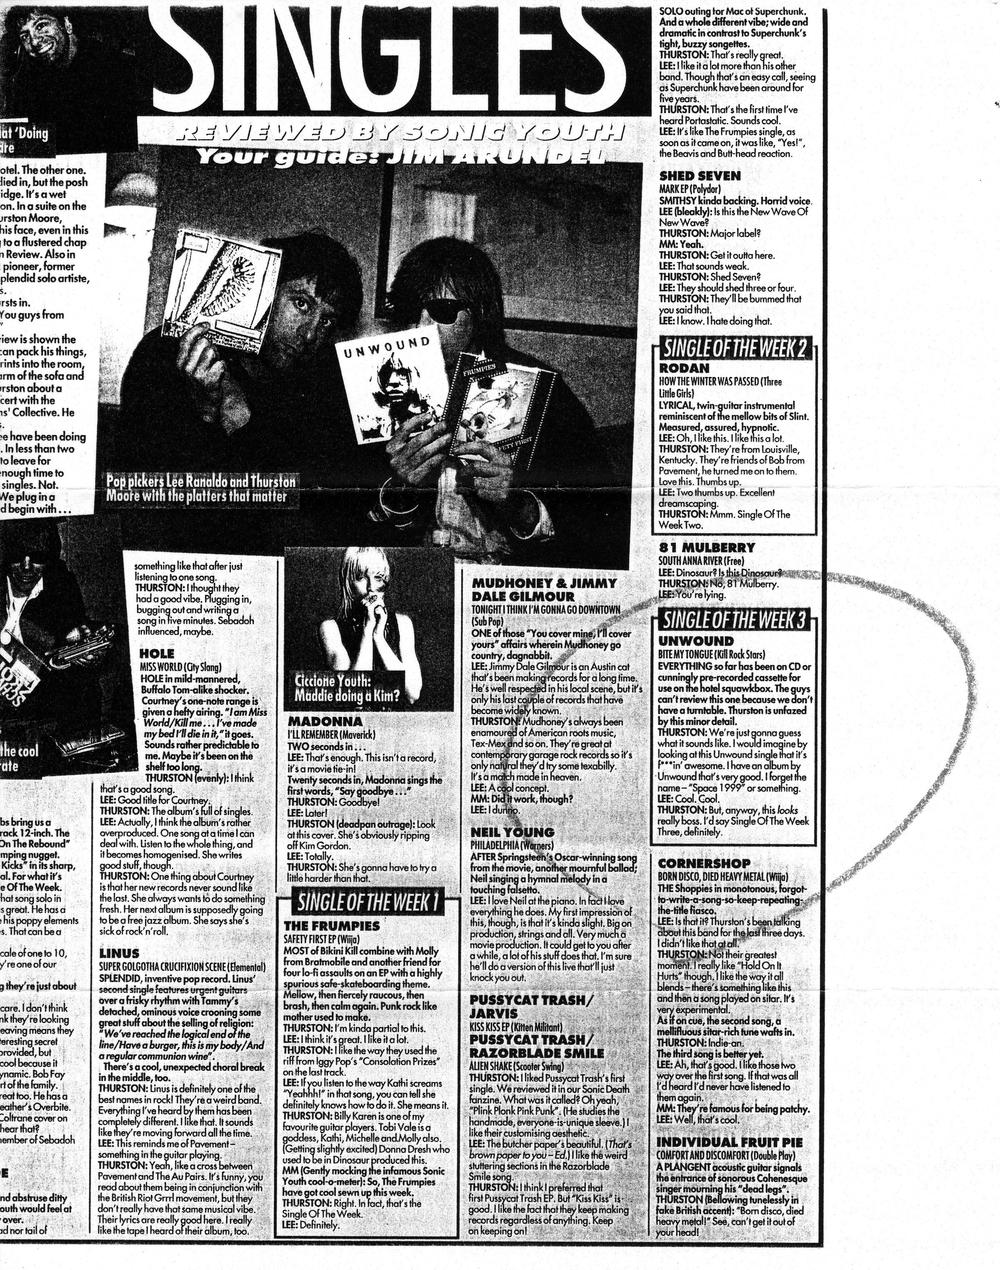 NME_singleoftheweek.jpg